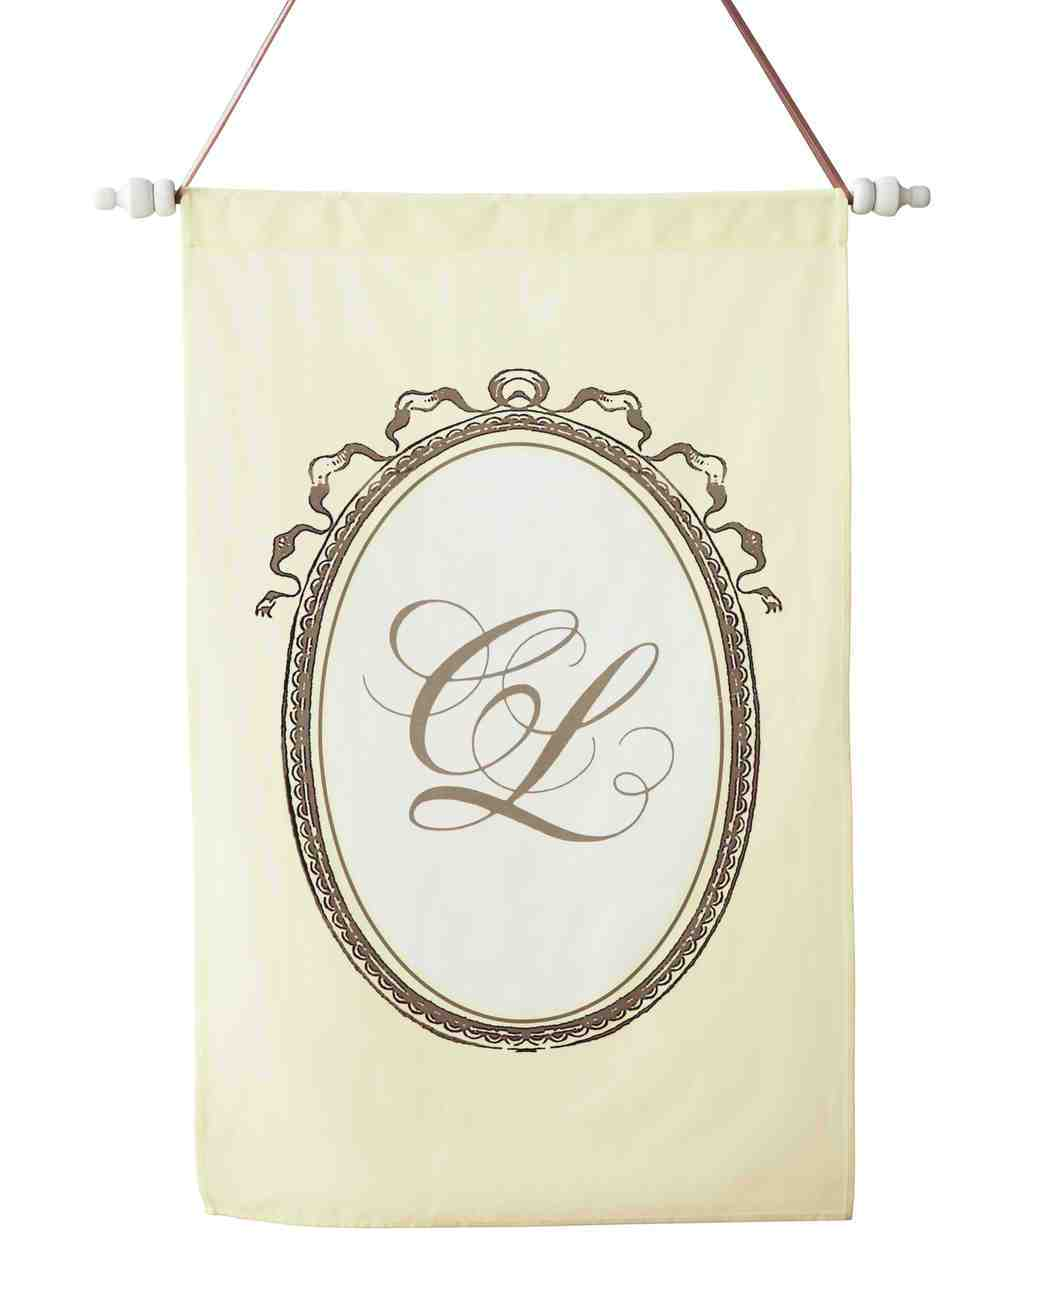 Wedding clipart martha stewart 7 » Clipart Portal.